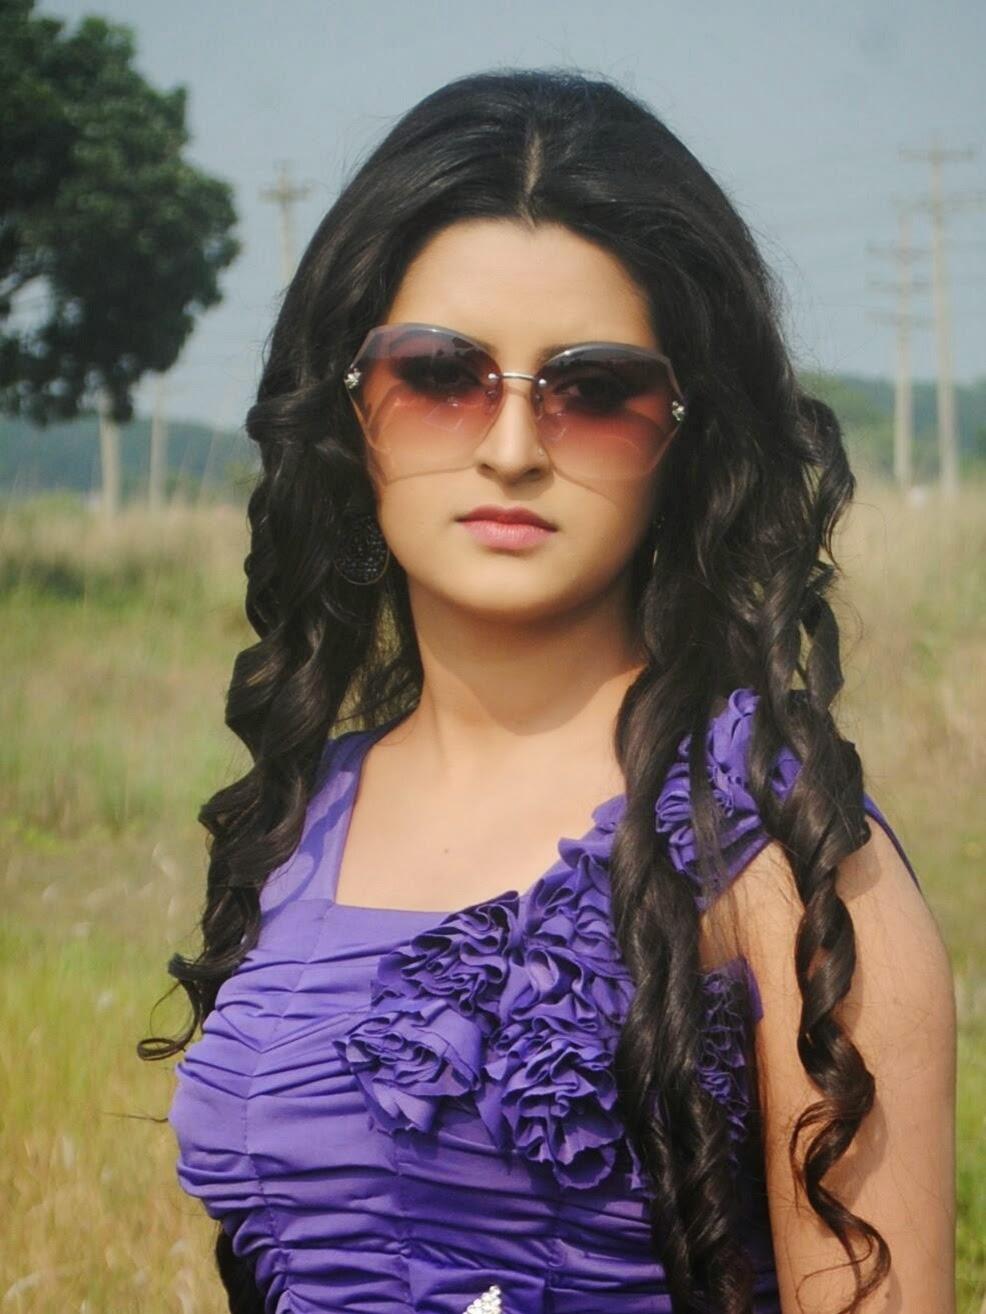 indian girl topless selfie